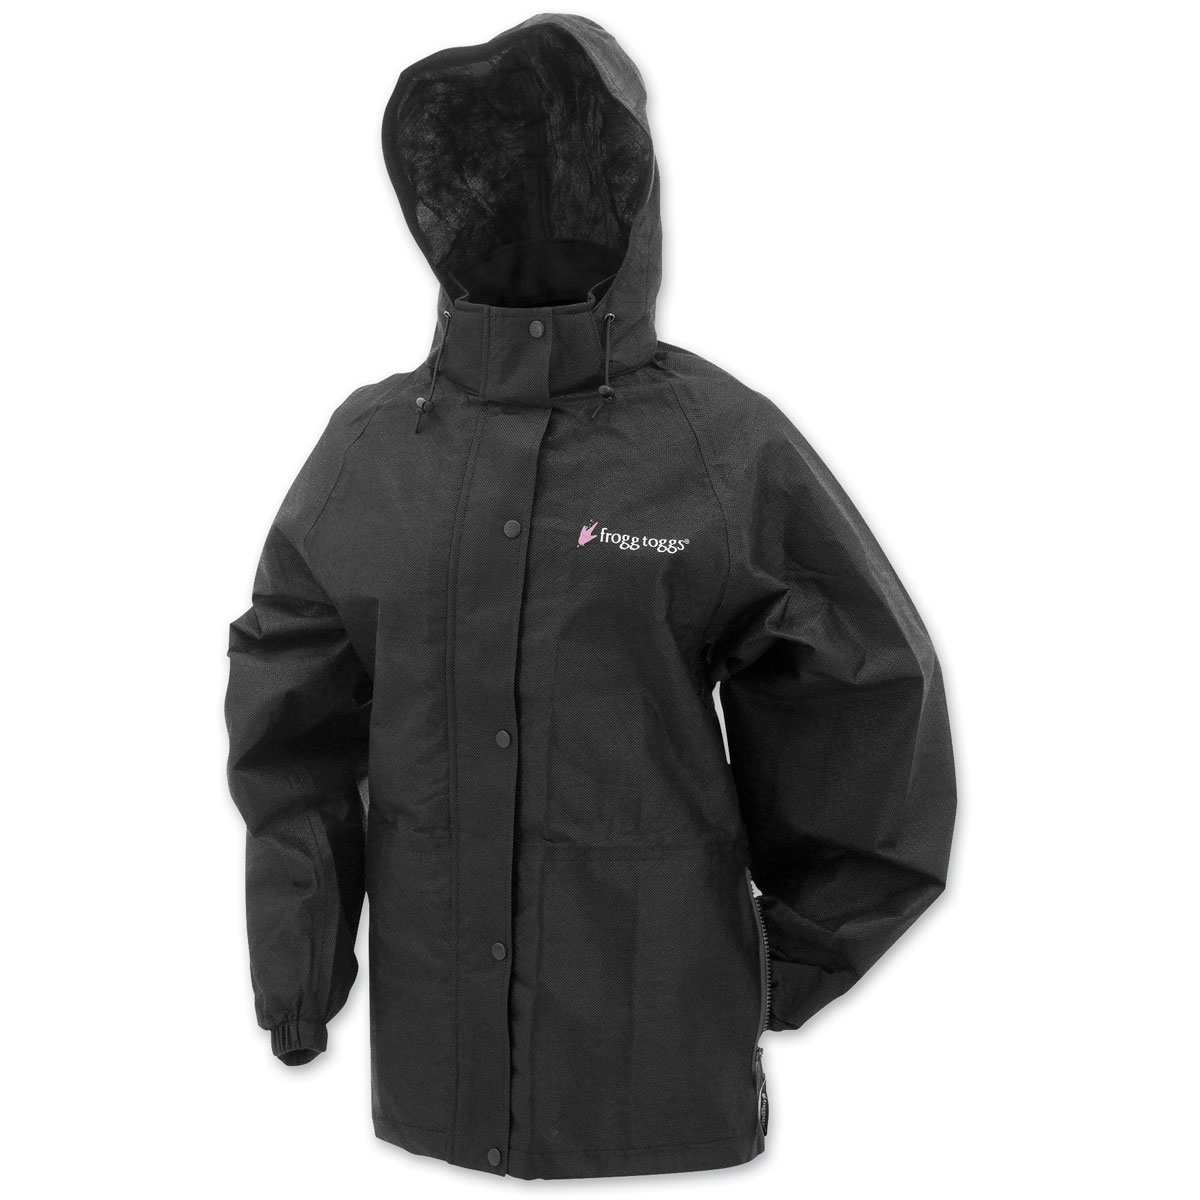 Frogg Toggs Women's Pro Action Black Rain Jacket